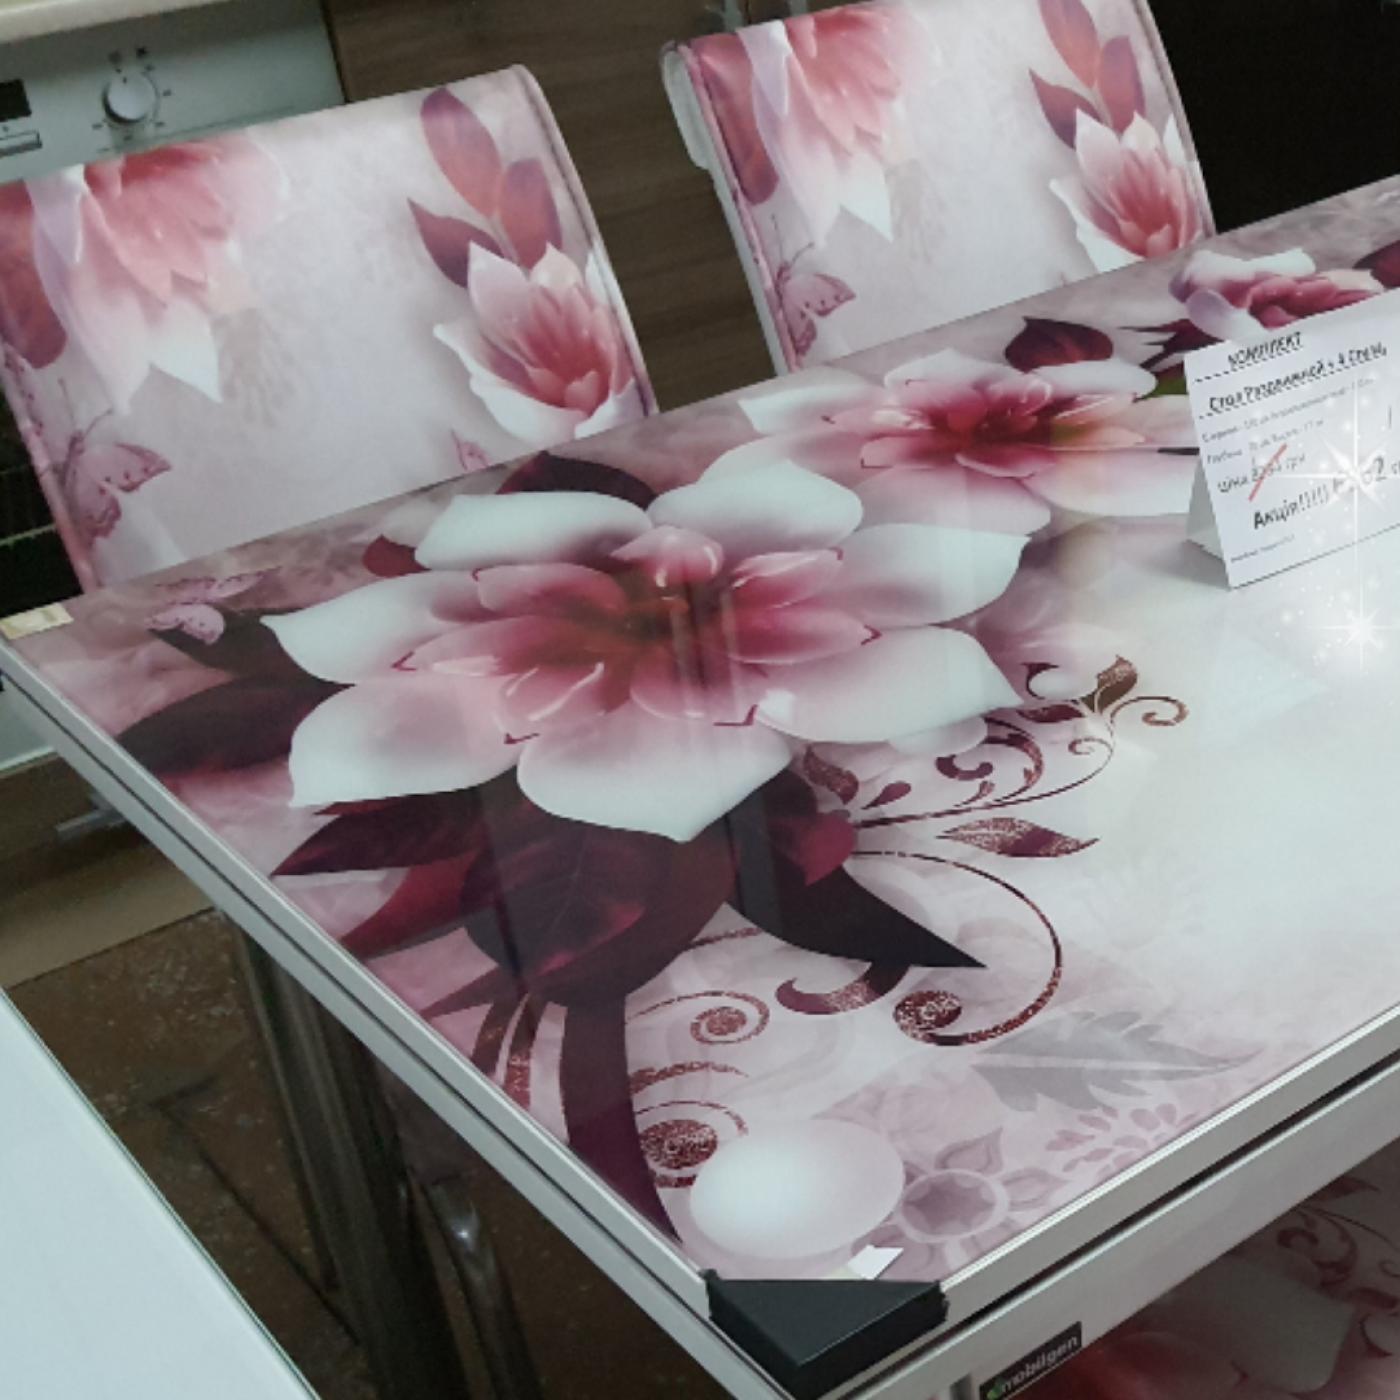 Стол стекло/хром/дсп + 4 стула (мягкий)№1301 (розовый цветок) 110*70 (170*70)